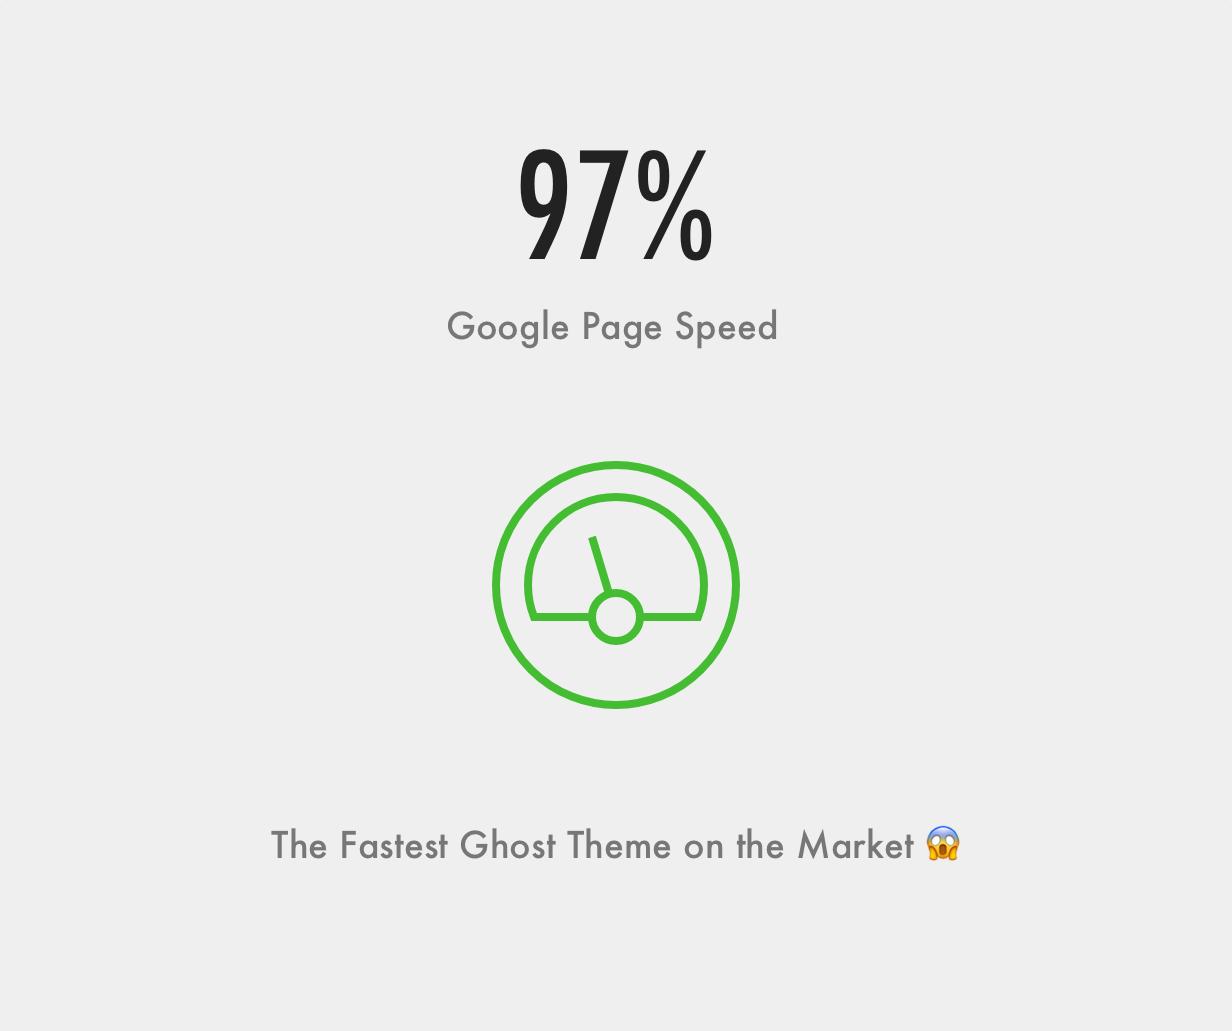 Sinai Ghost Theme Google Page Speed Record